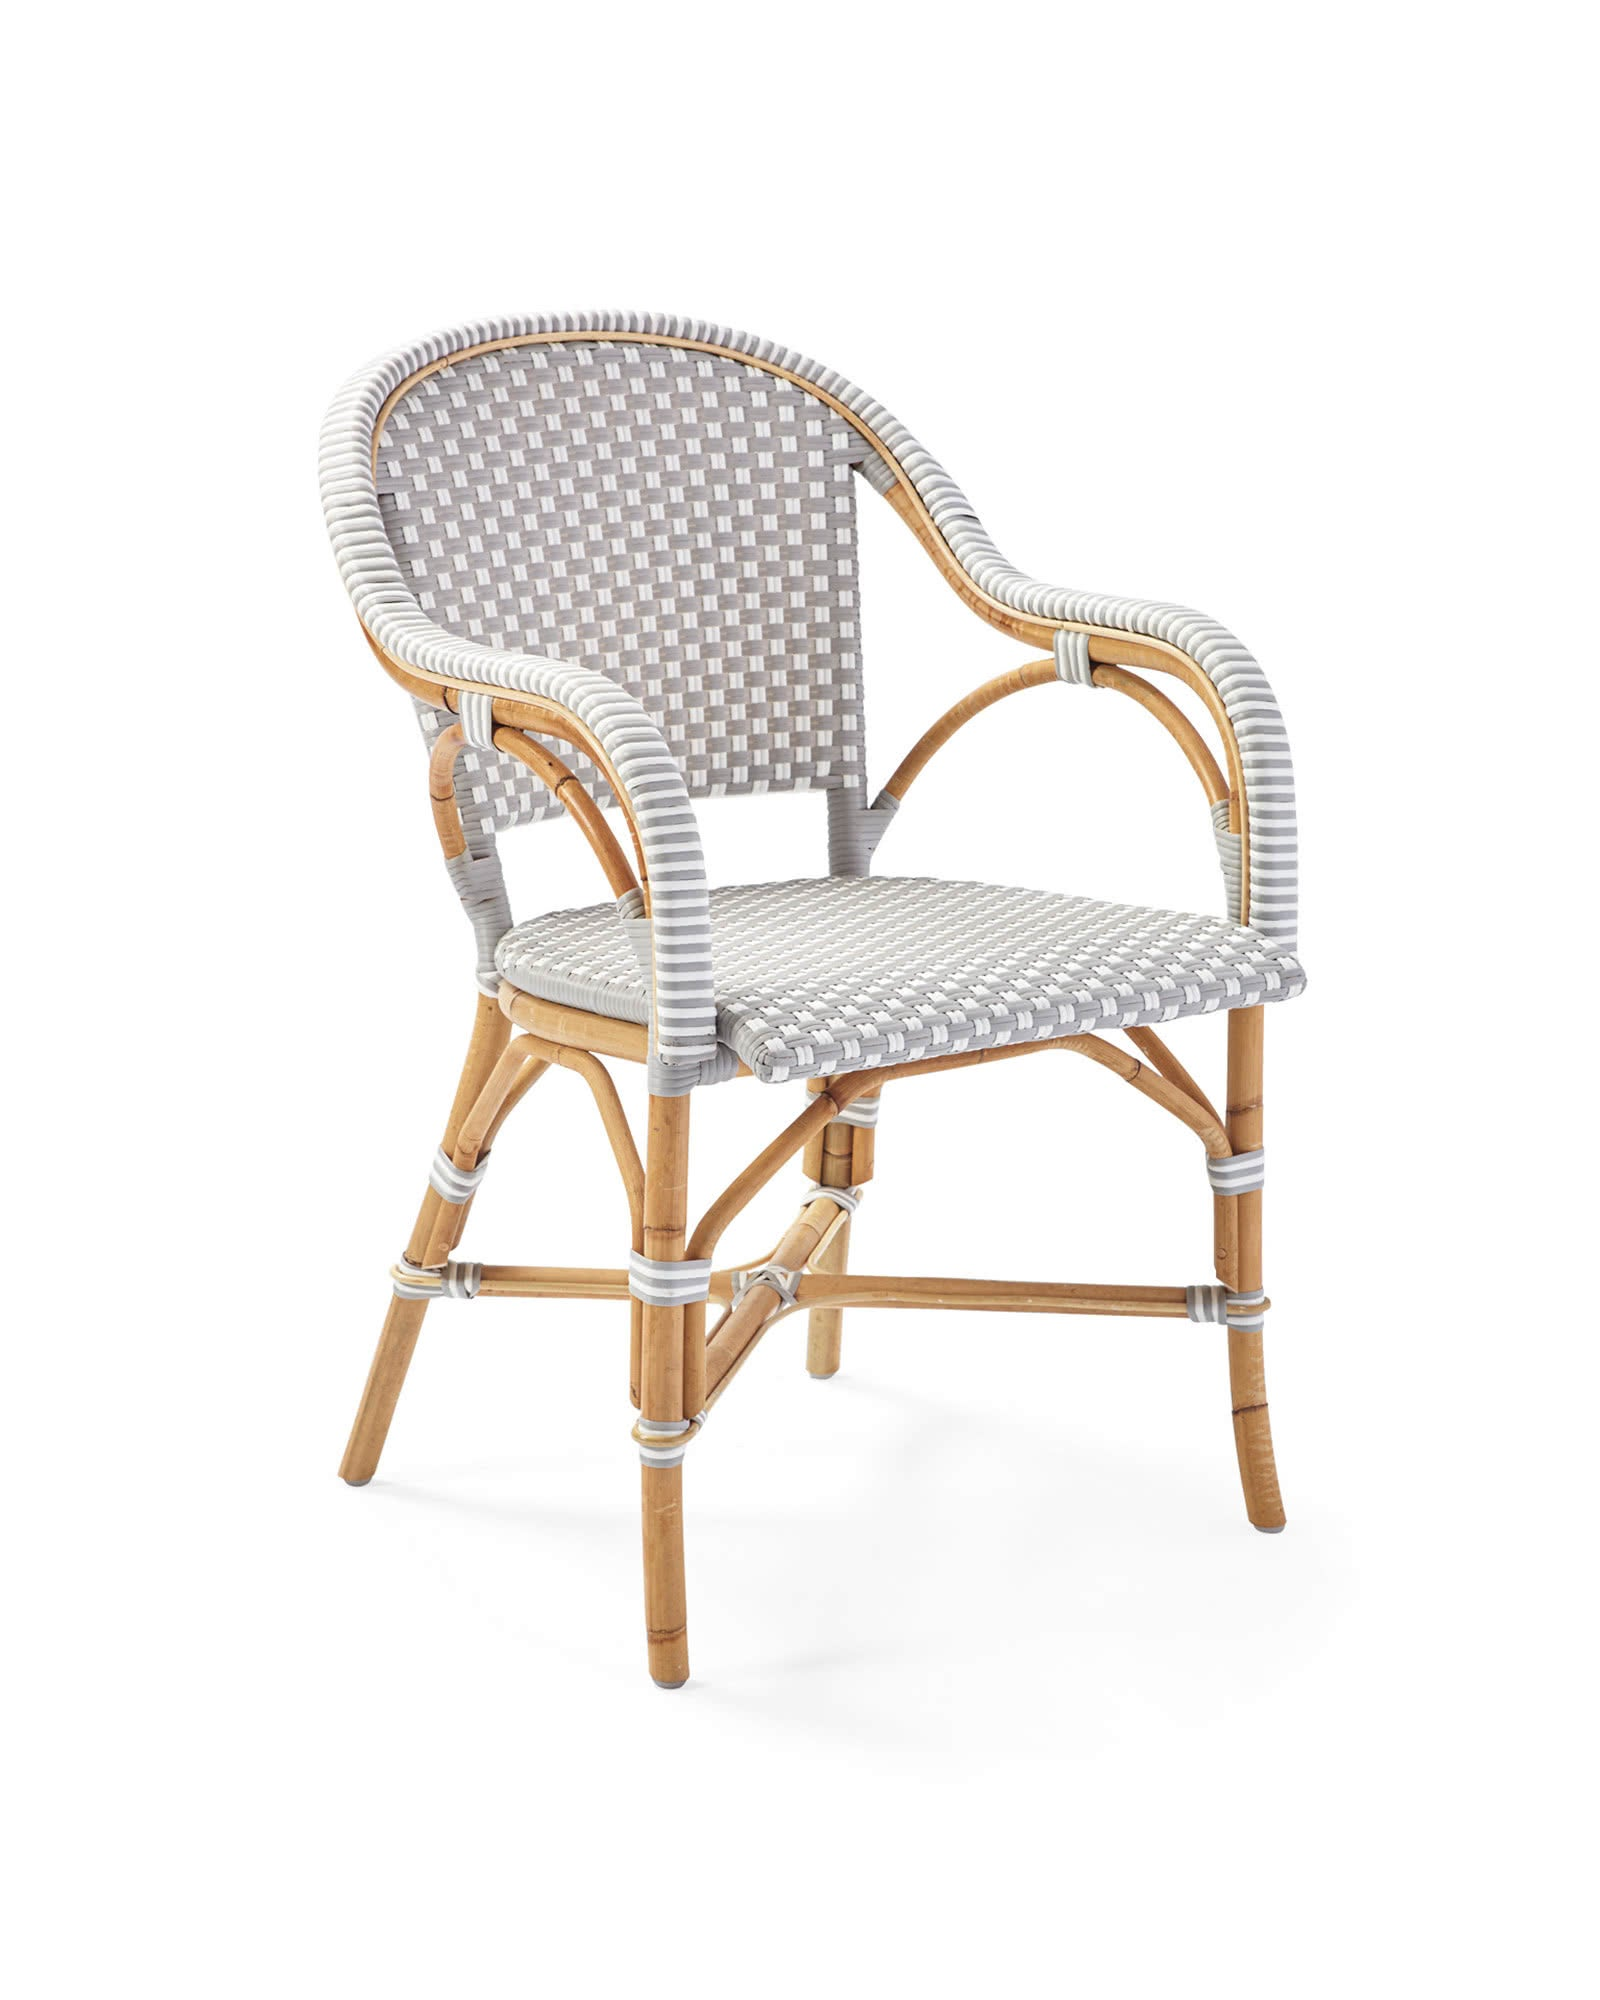 Furn_New_Riviera_Arm_Chair_Fog_Angle_MV_0146_Crop_SH